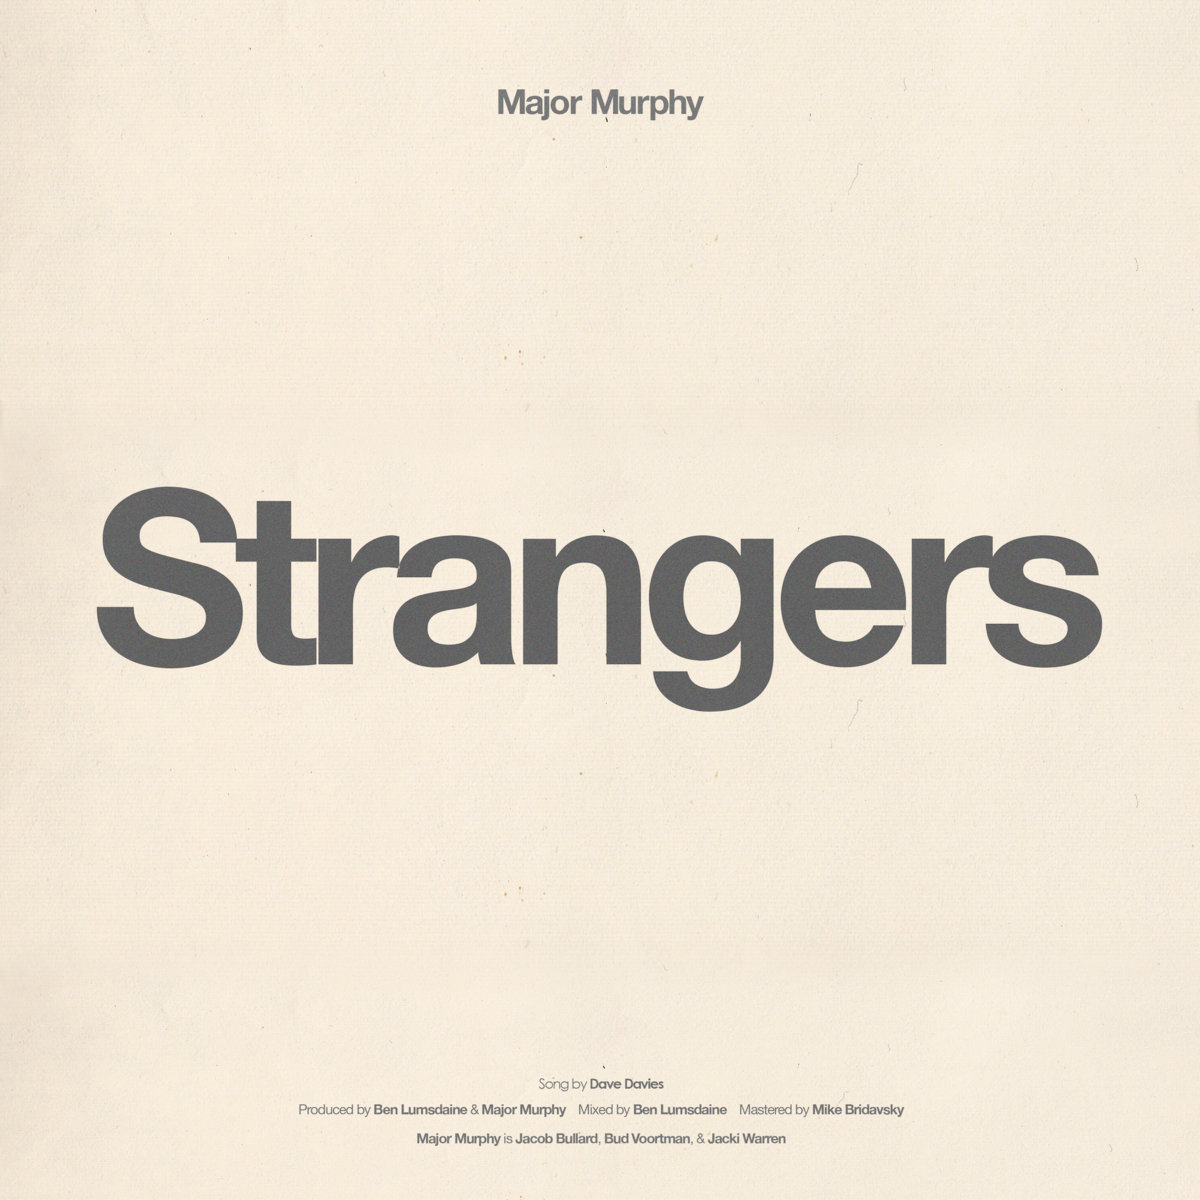 Major Murphy - Strangers